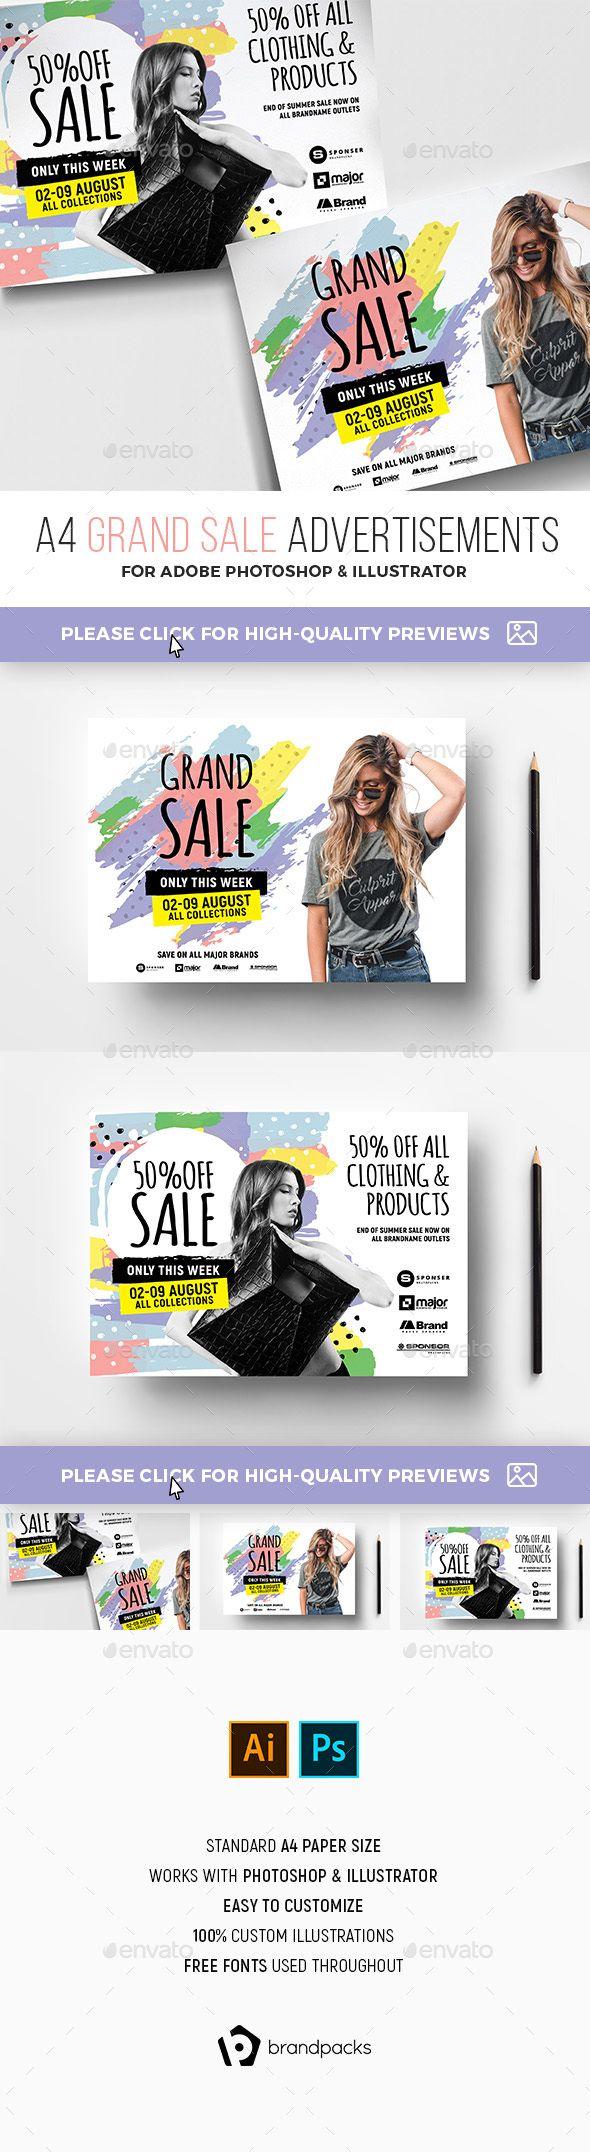 Grand Sale Advertisement Templates PSD, AI